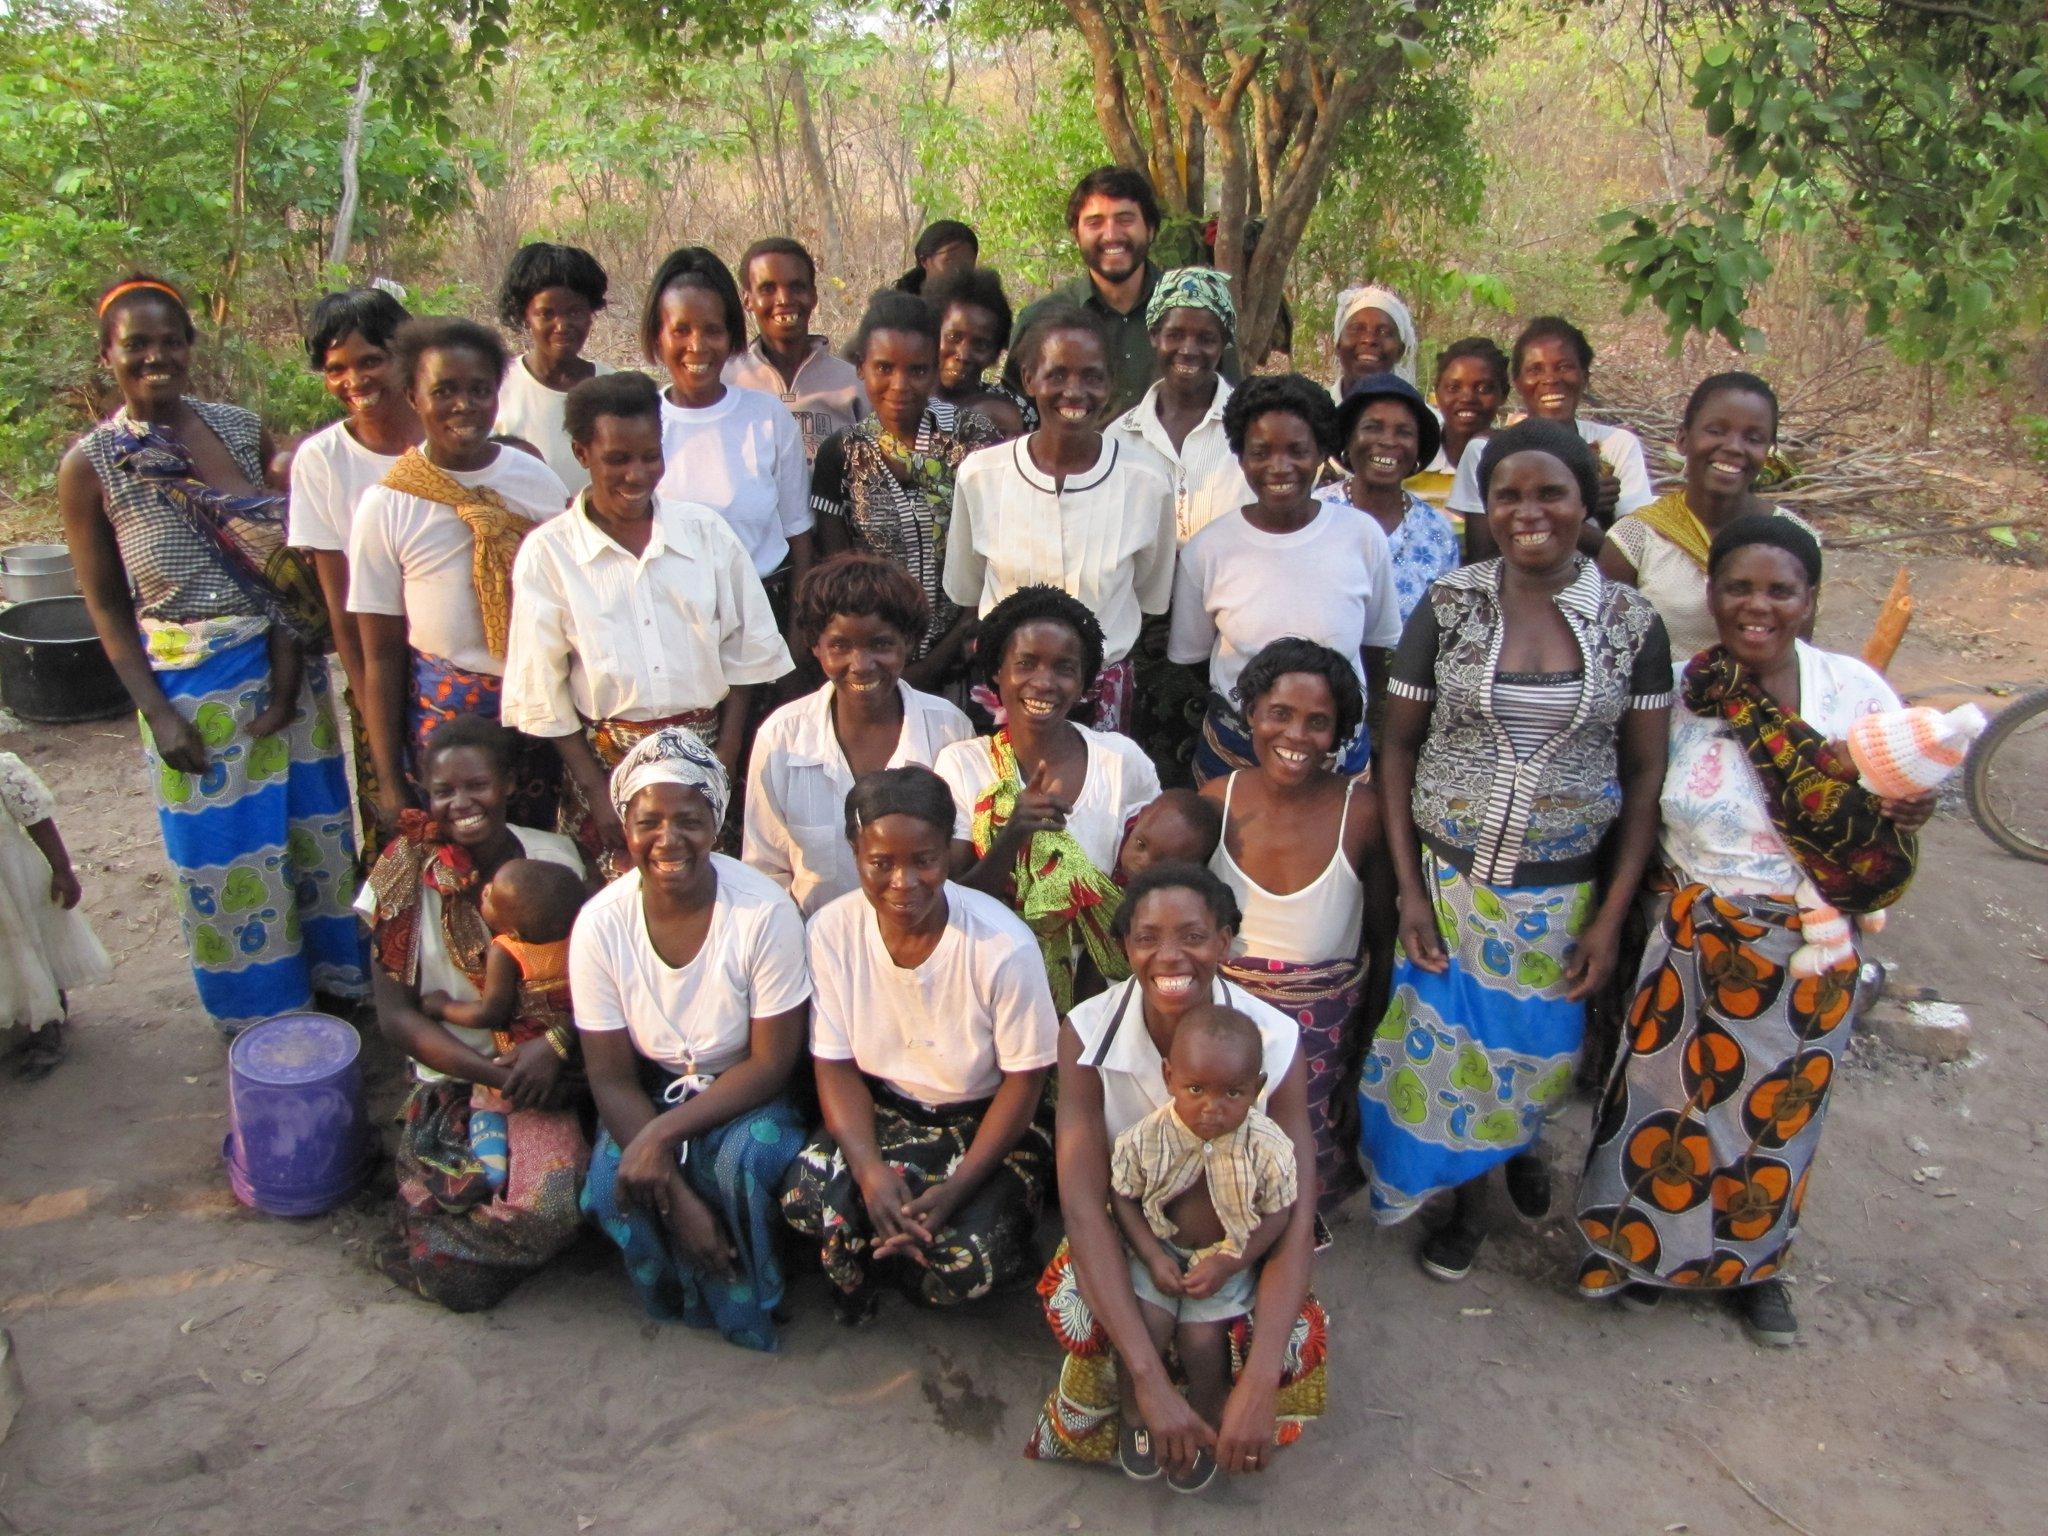 Tubombeshe Women's Cooperative